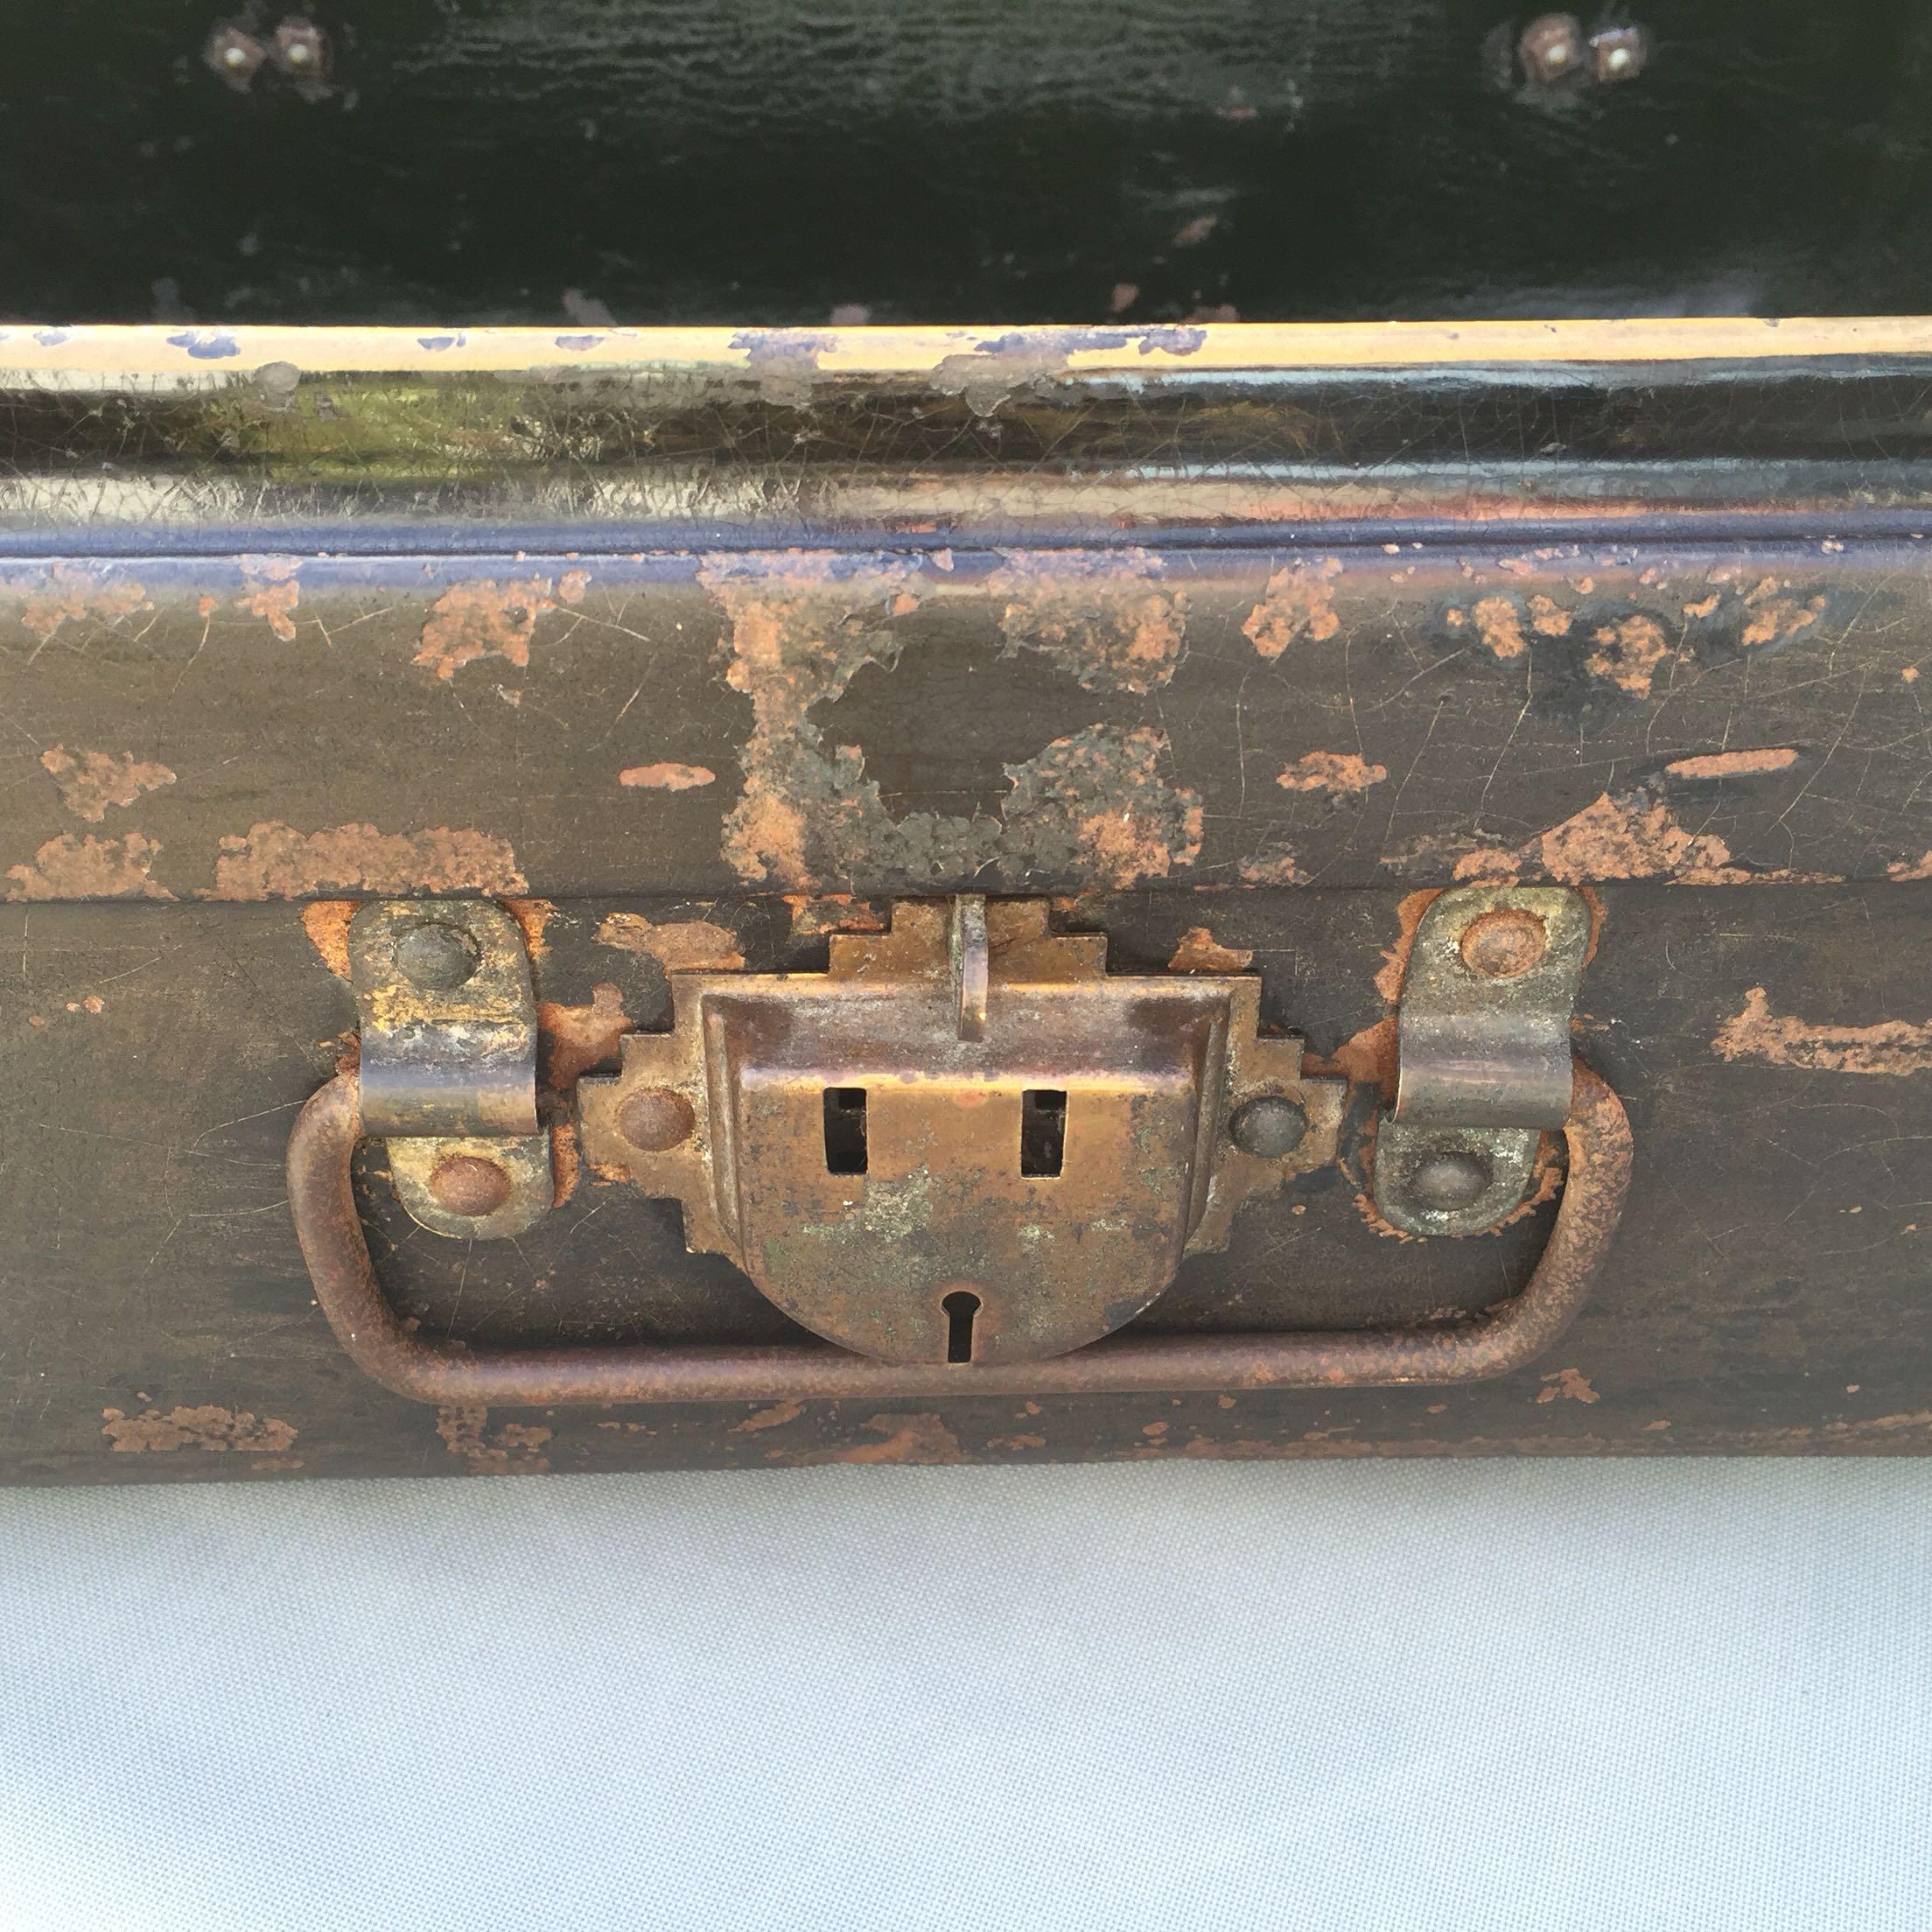 Vintage Steamer Trunk For Sale In Uk View 150 Bargains